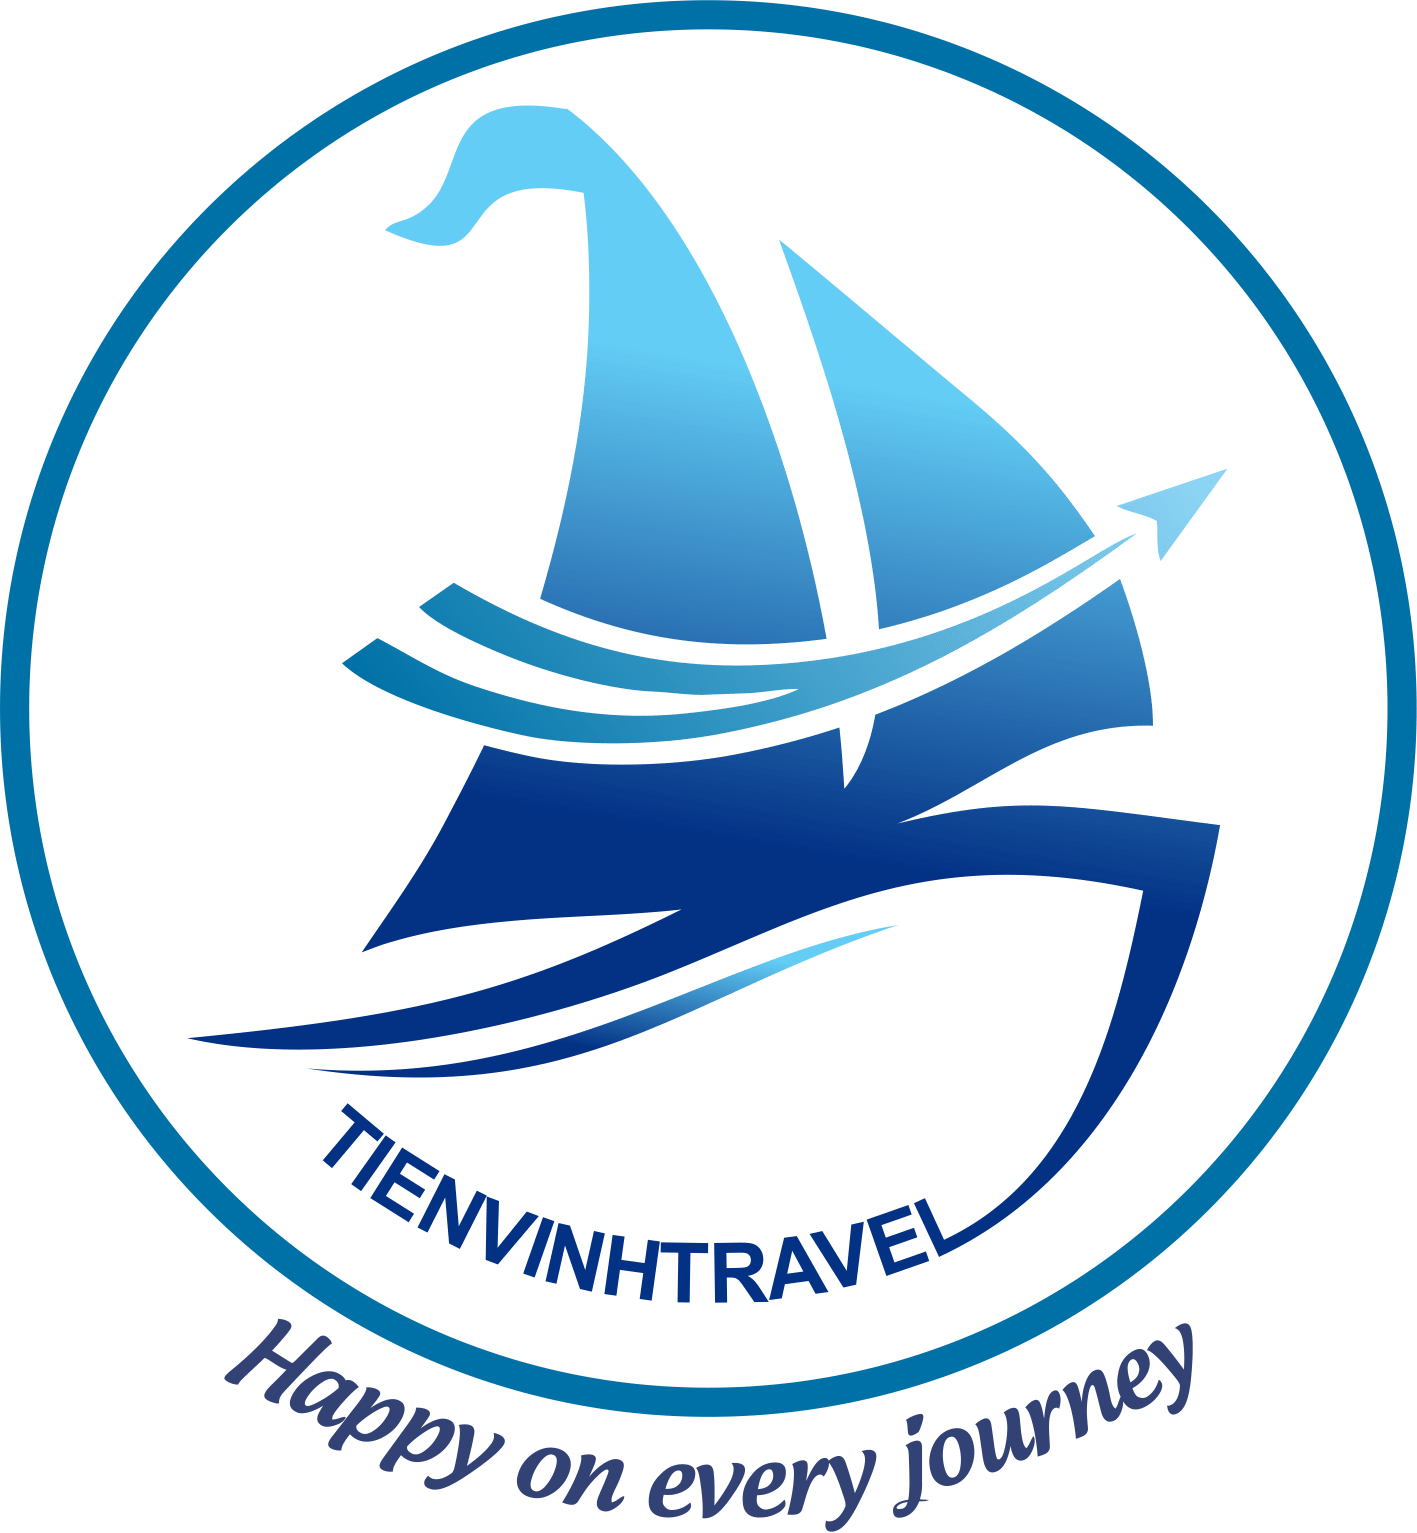 Tiến Vinh Travel